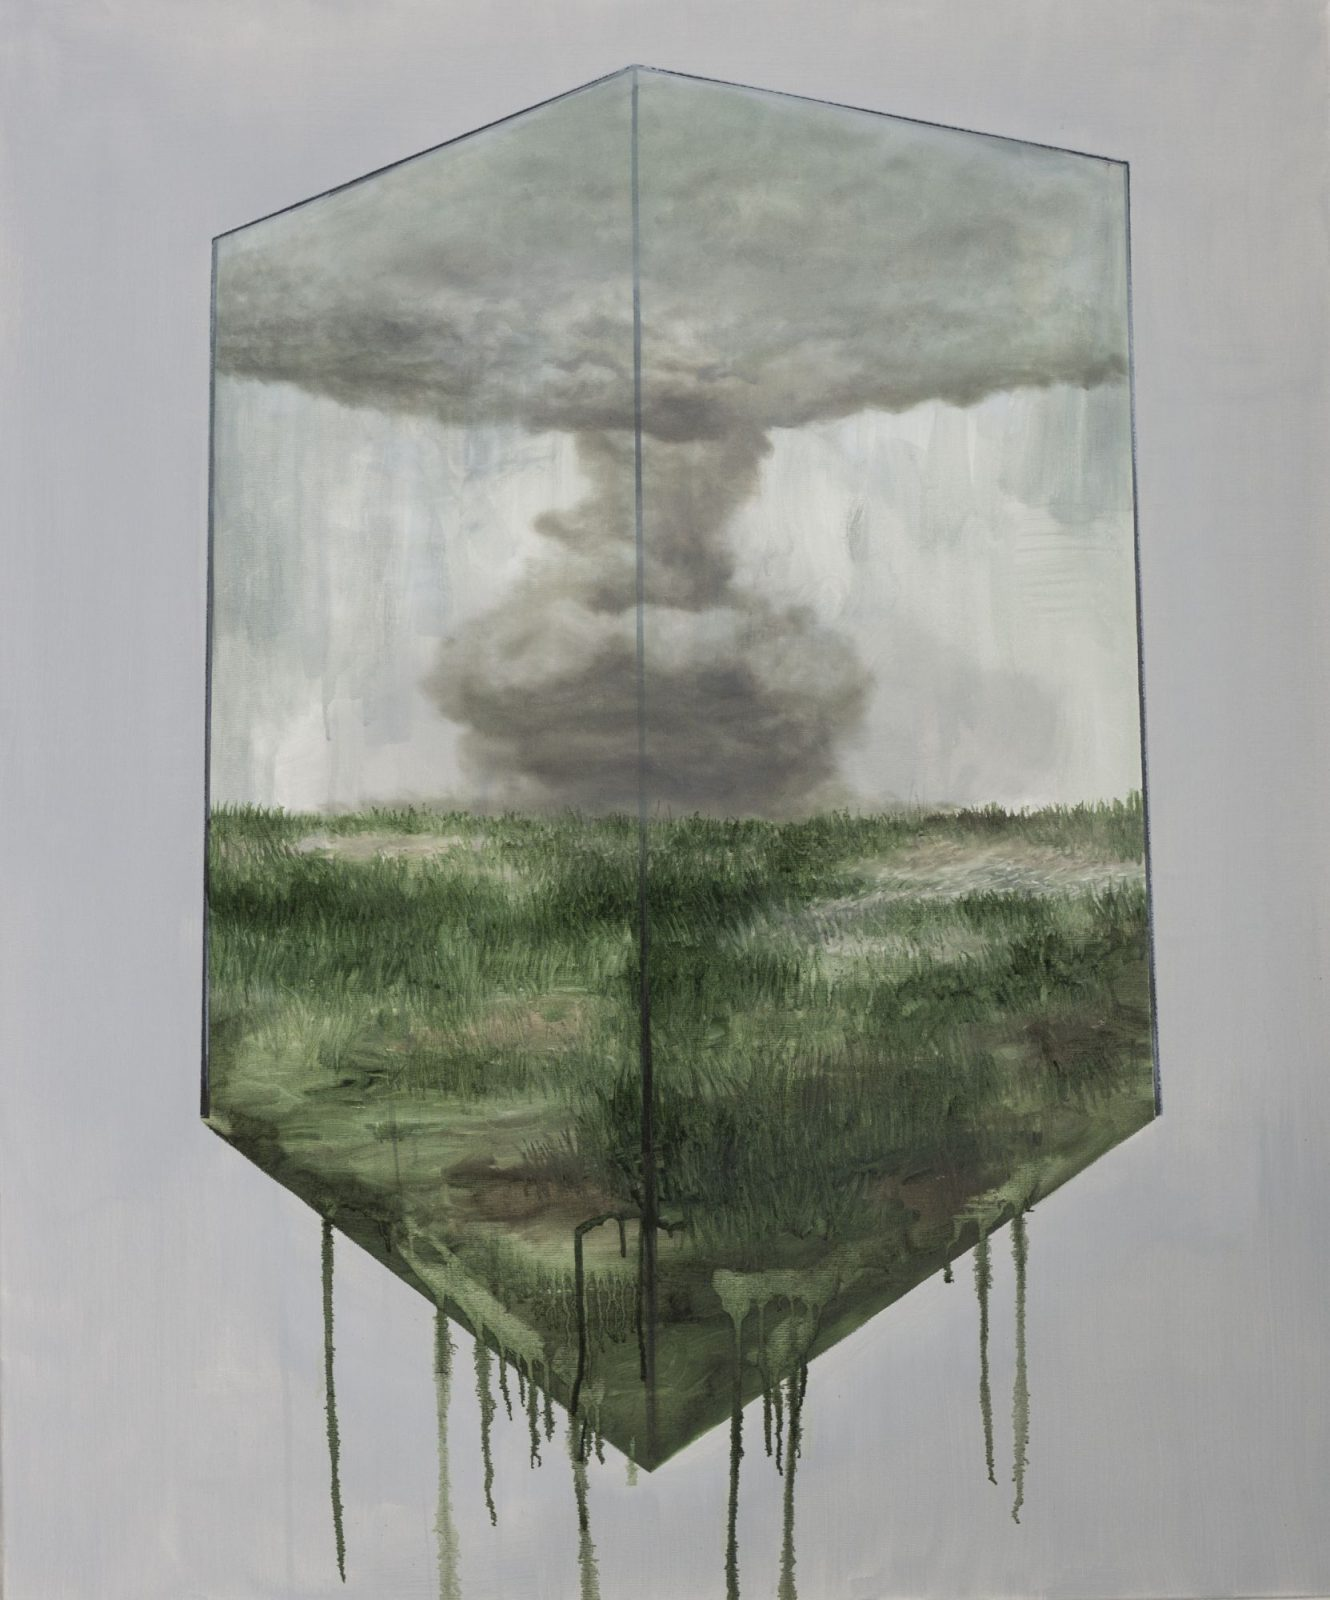 Herman Levente: Atom terrárium